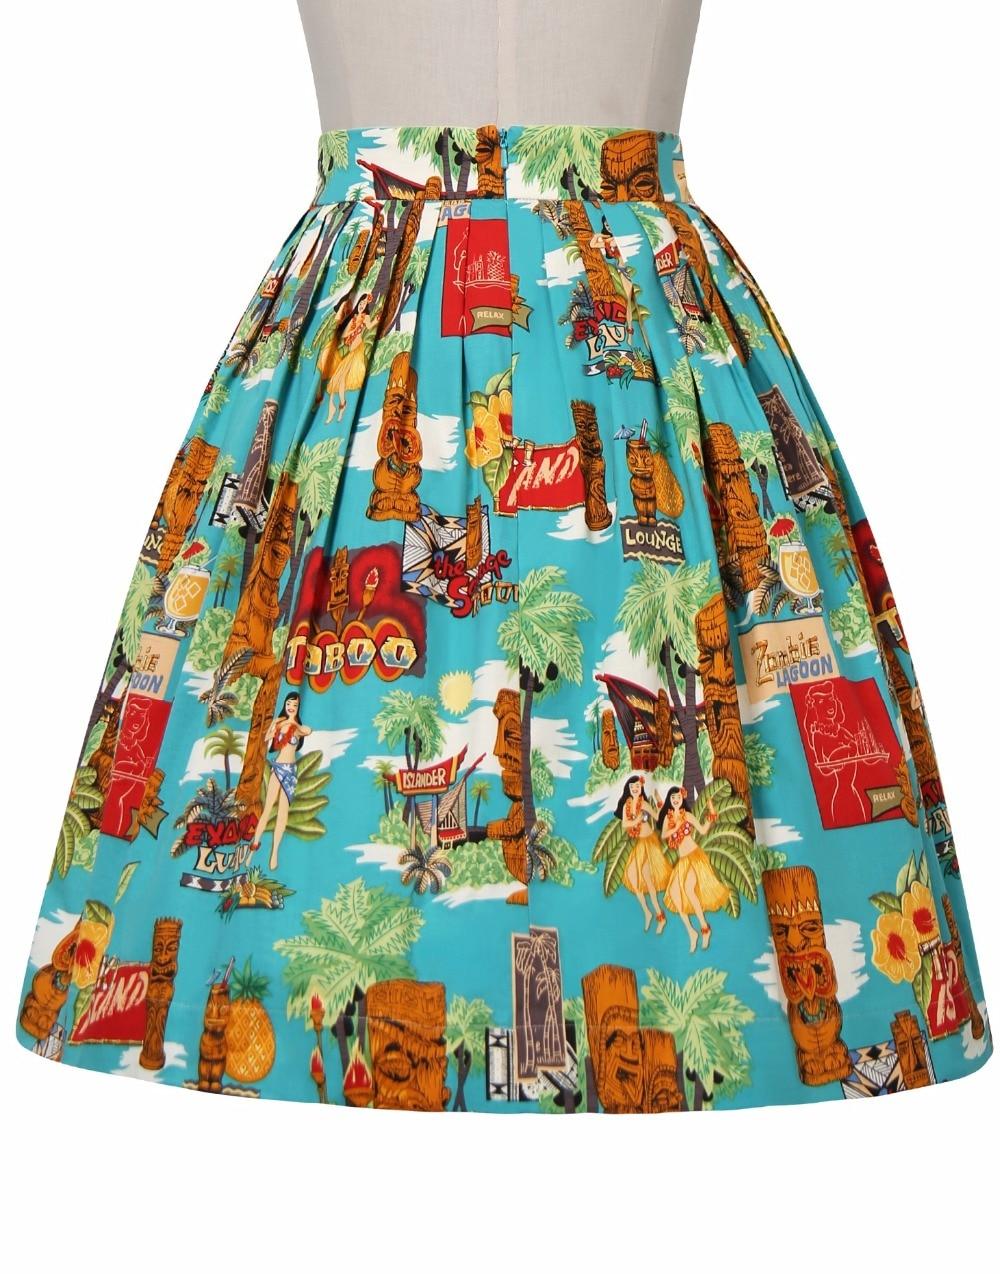 Pin Jupe Jupes 25 Bouton up Vintage As Taille Coton Midi Saia La Up femmes Plissée Plus Moai S 4xl Swing 50 Rockabilly Show Robe Motif vv1AqOr